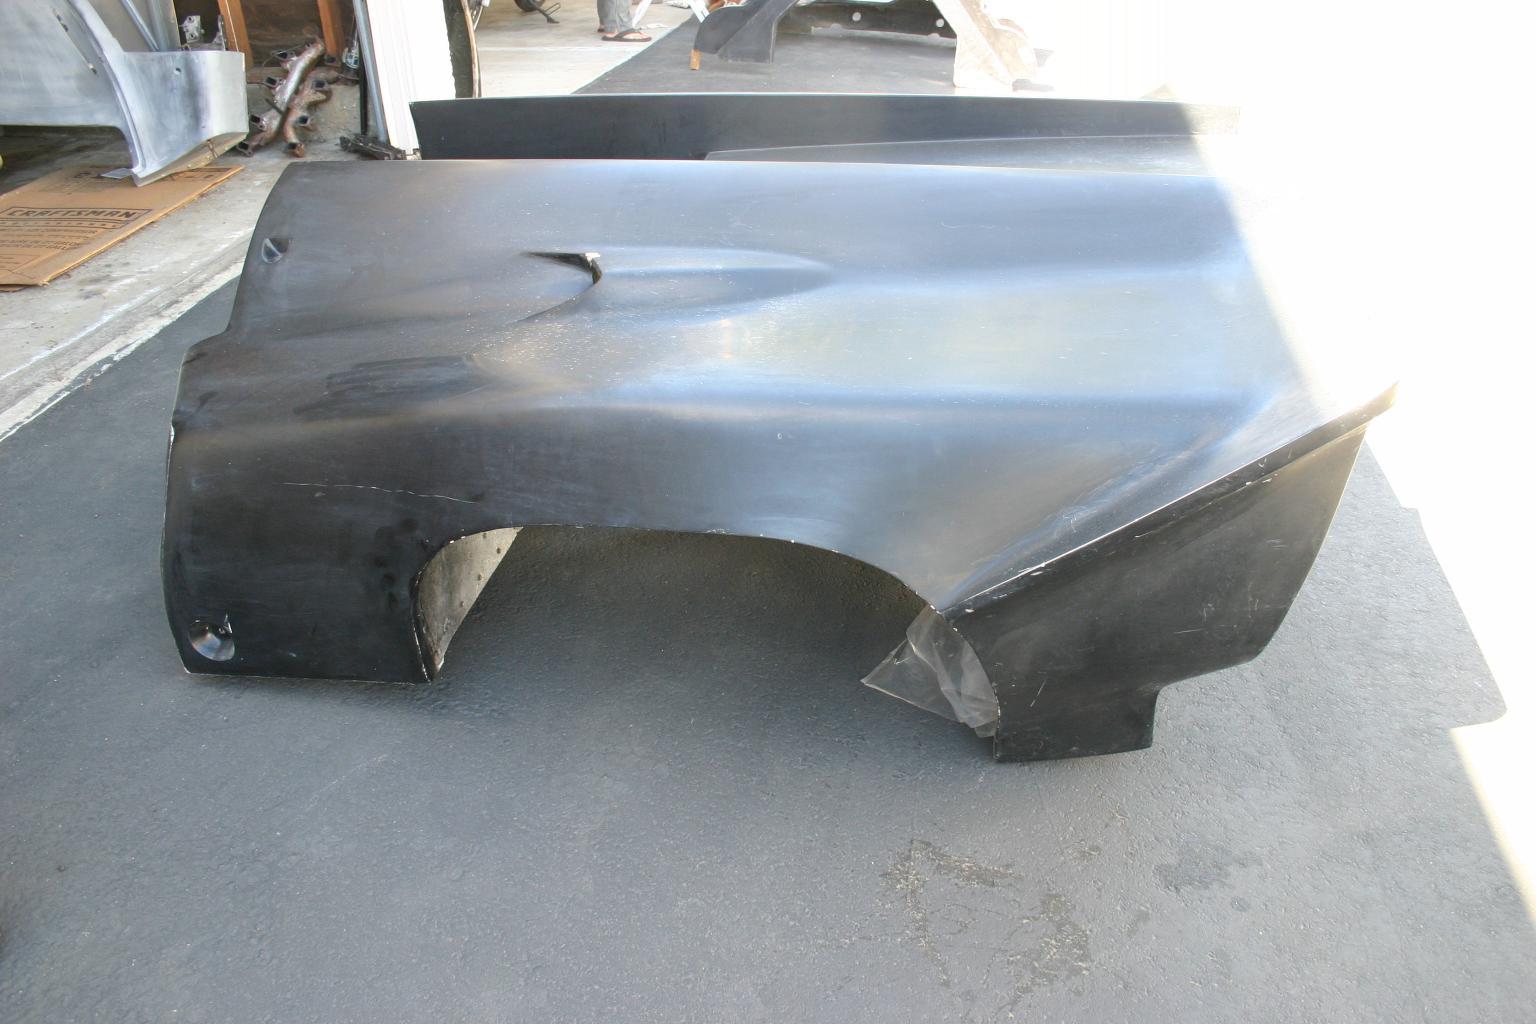 Lola T-70 MK3 B Tub & Bodywork coming in...-img_9478-jpg